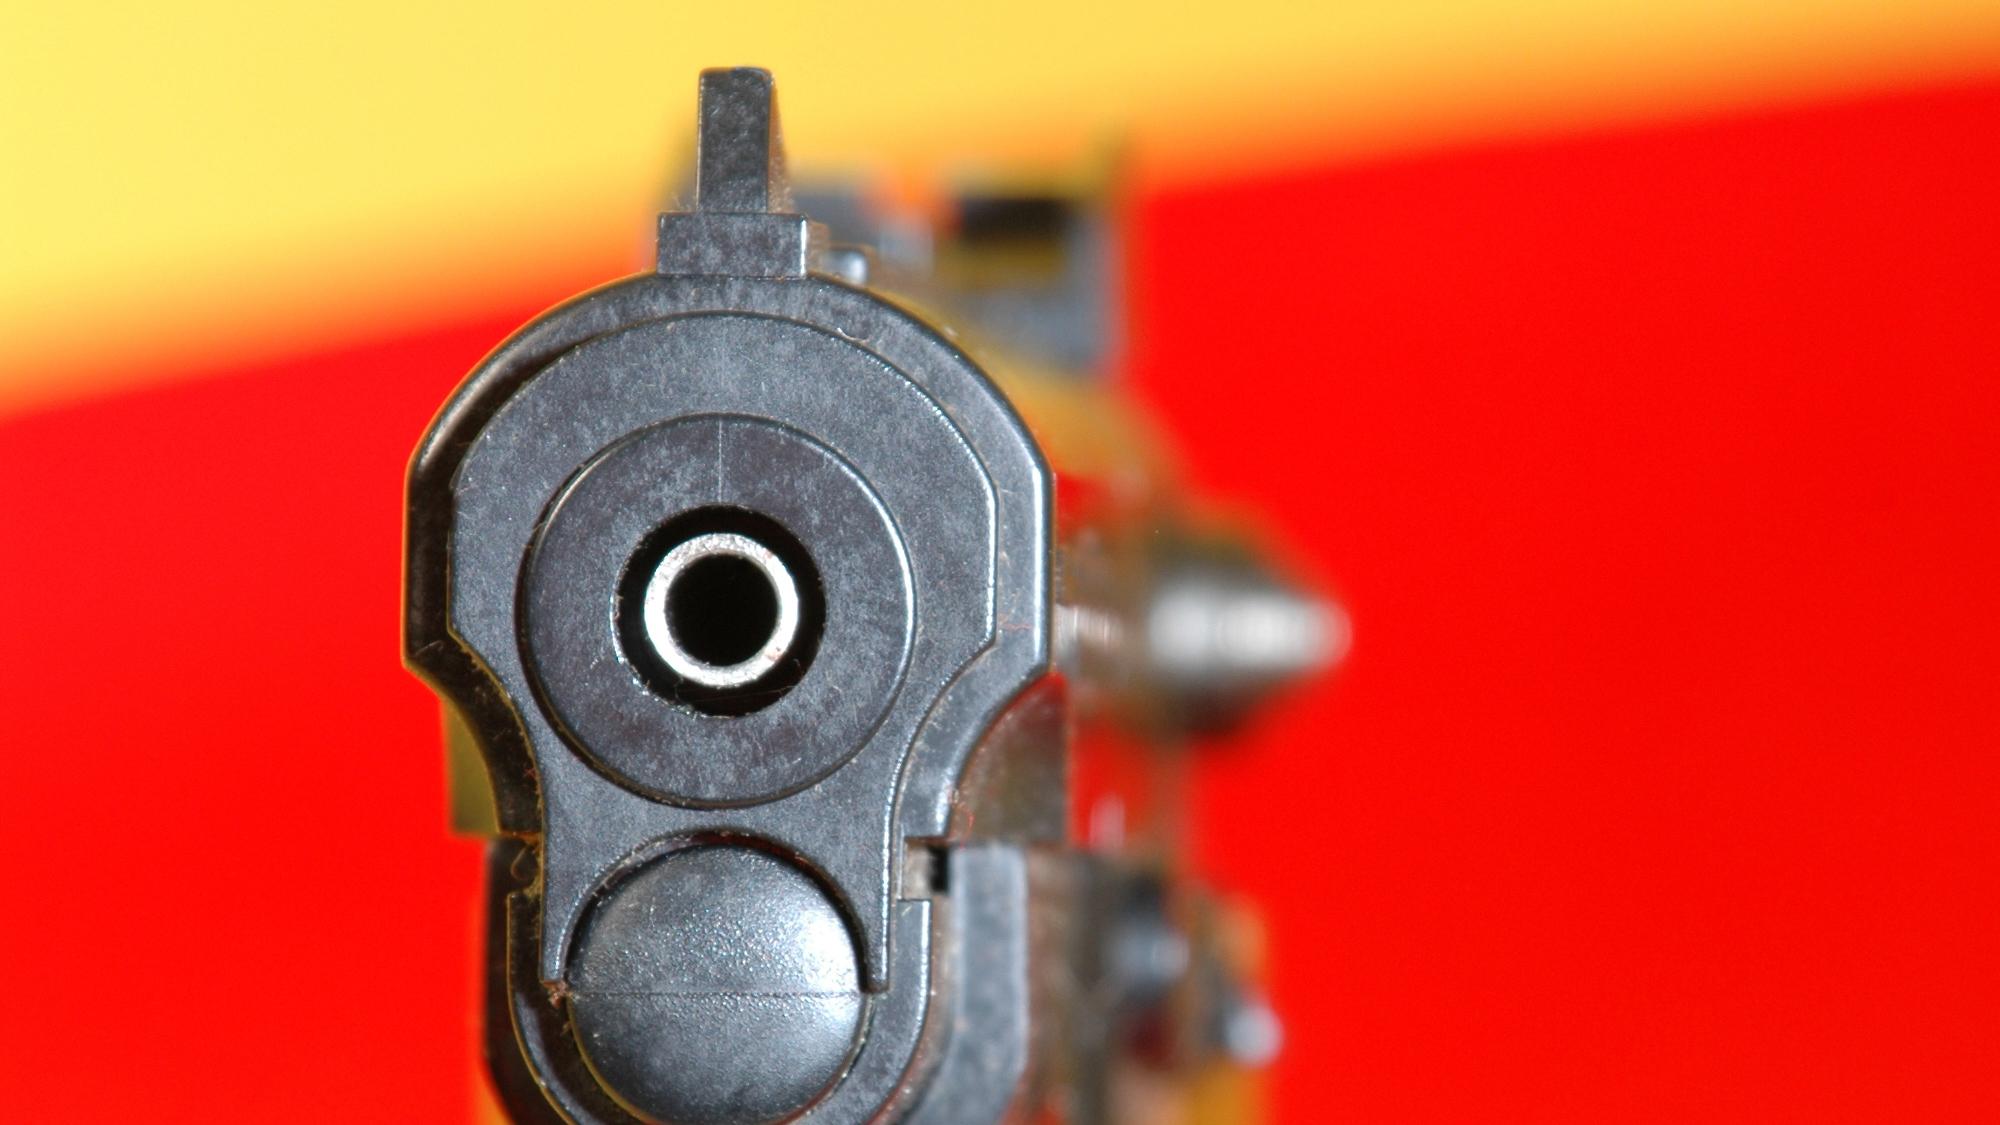 Stock image of a BB gun. (Thinkstock)